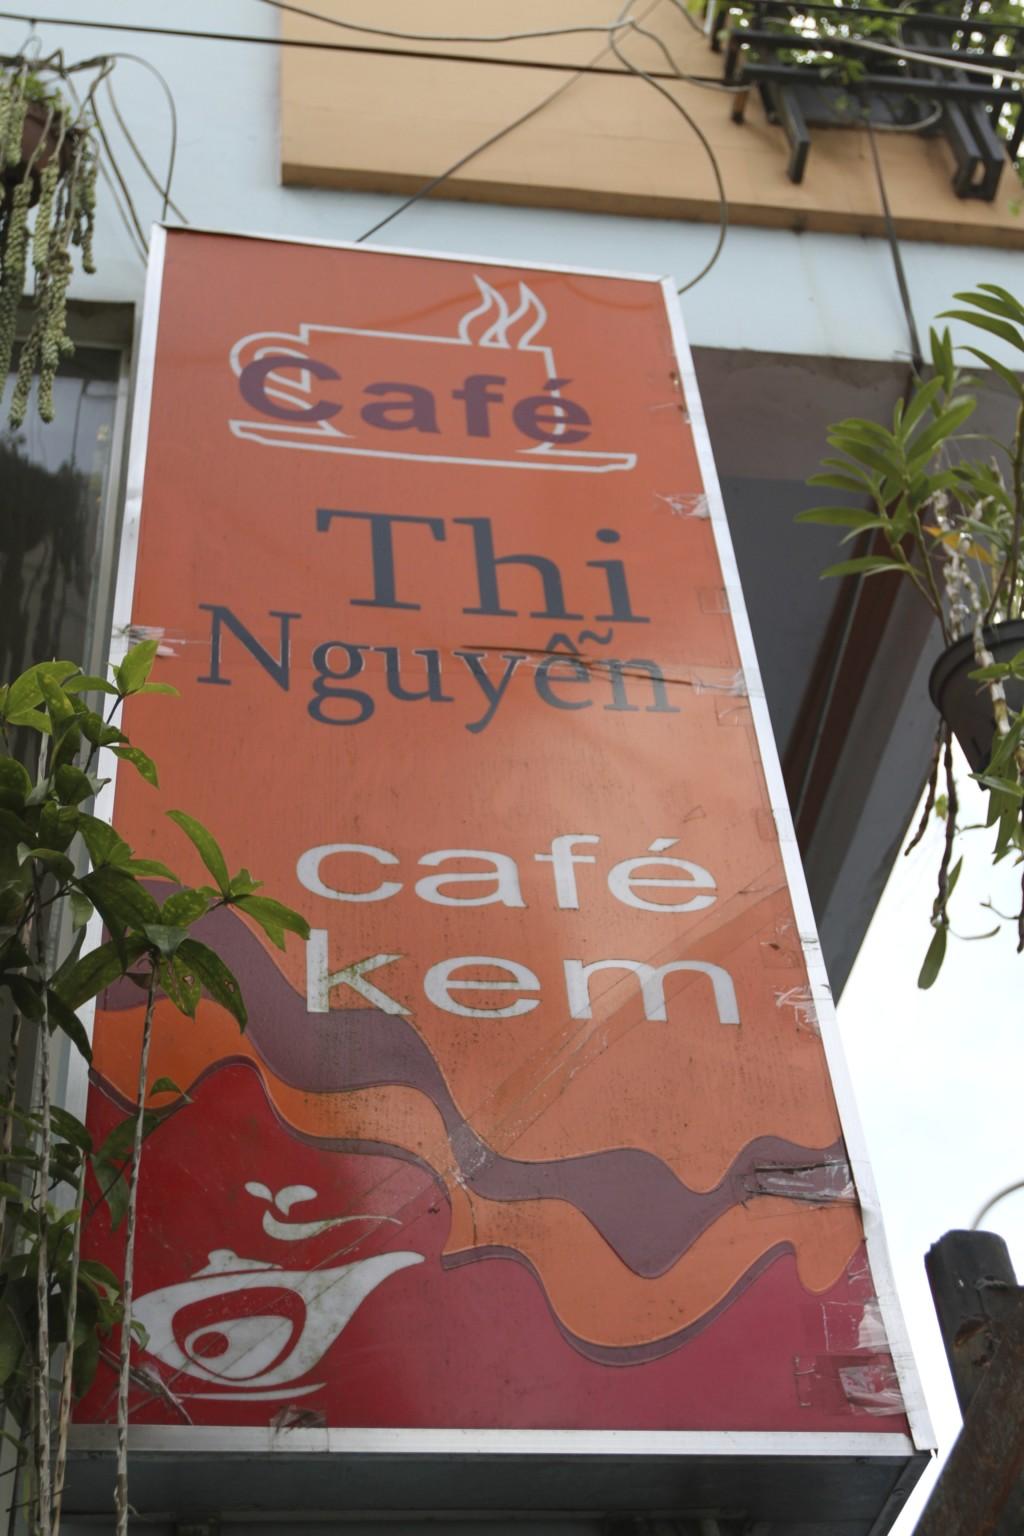 Thi Nguyenは、おそらくオーナーの名前だろう